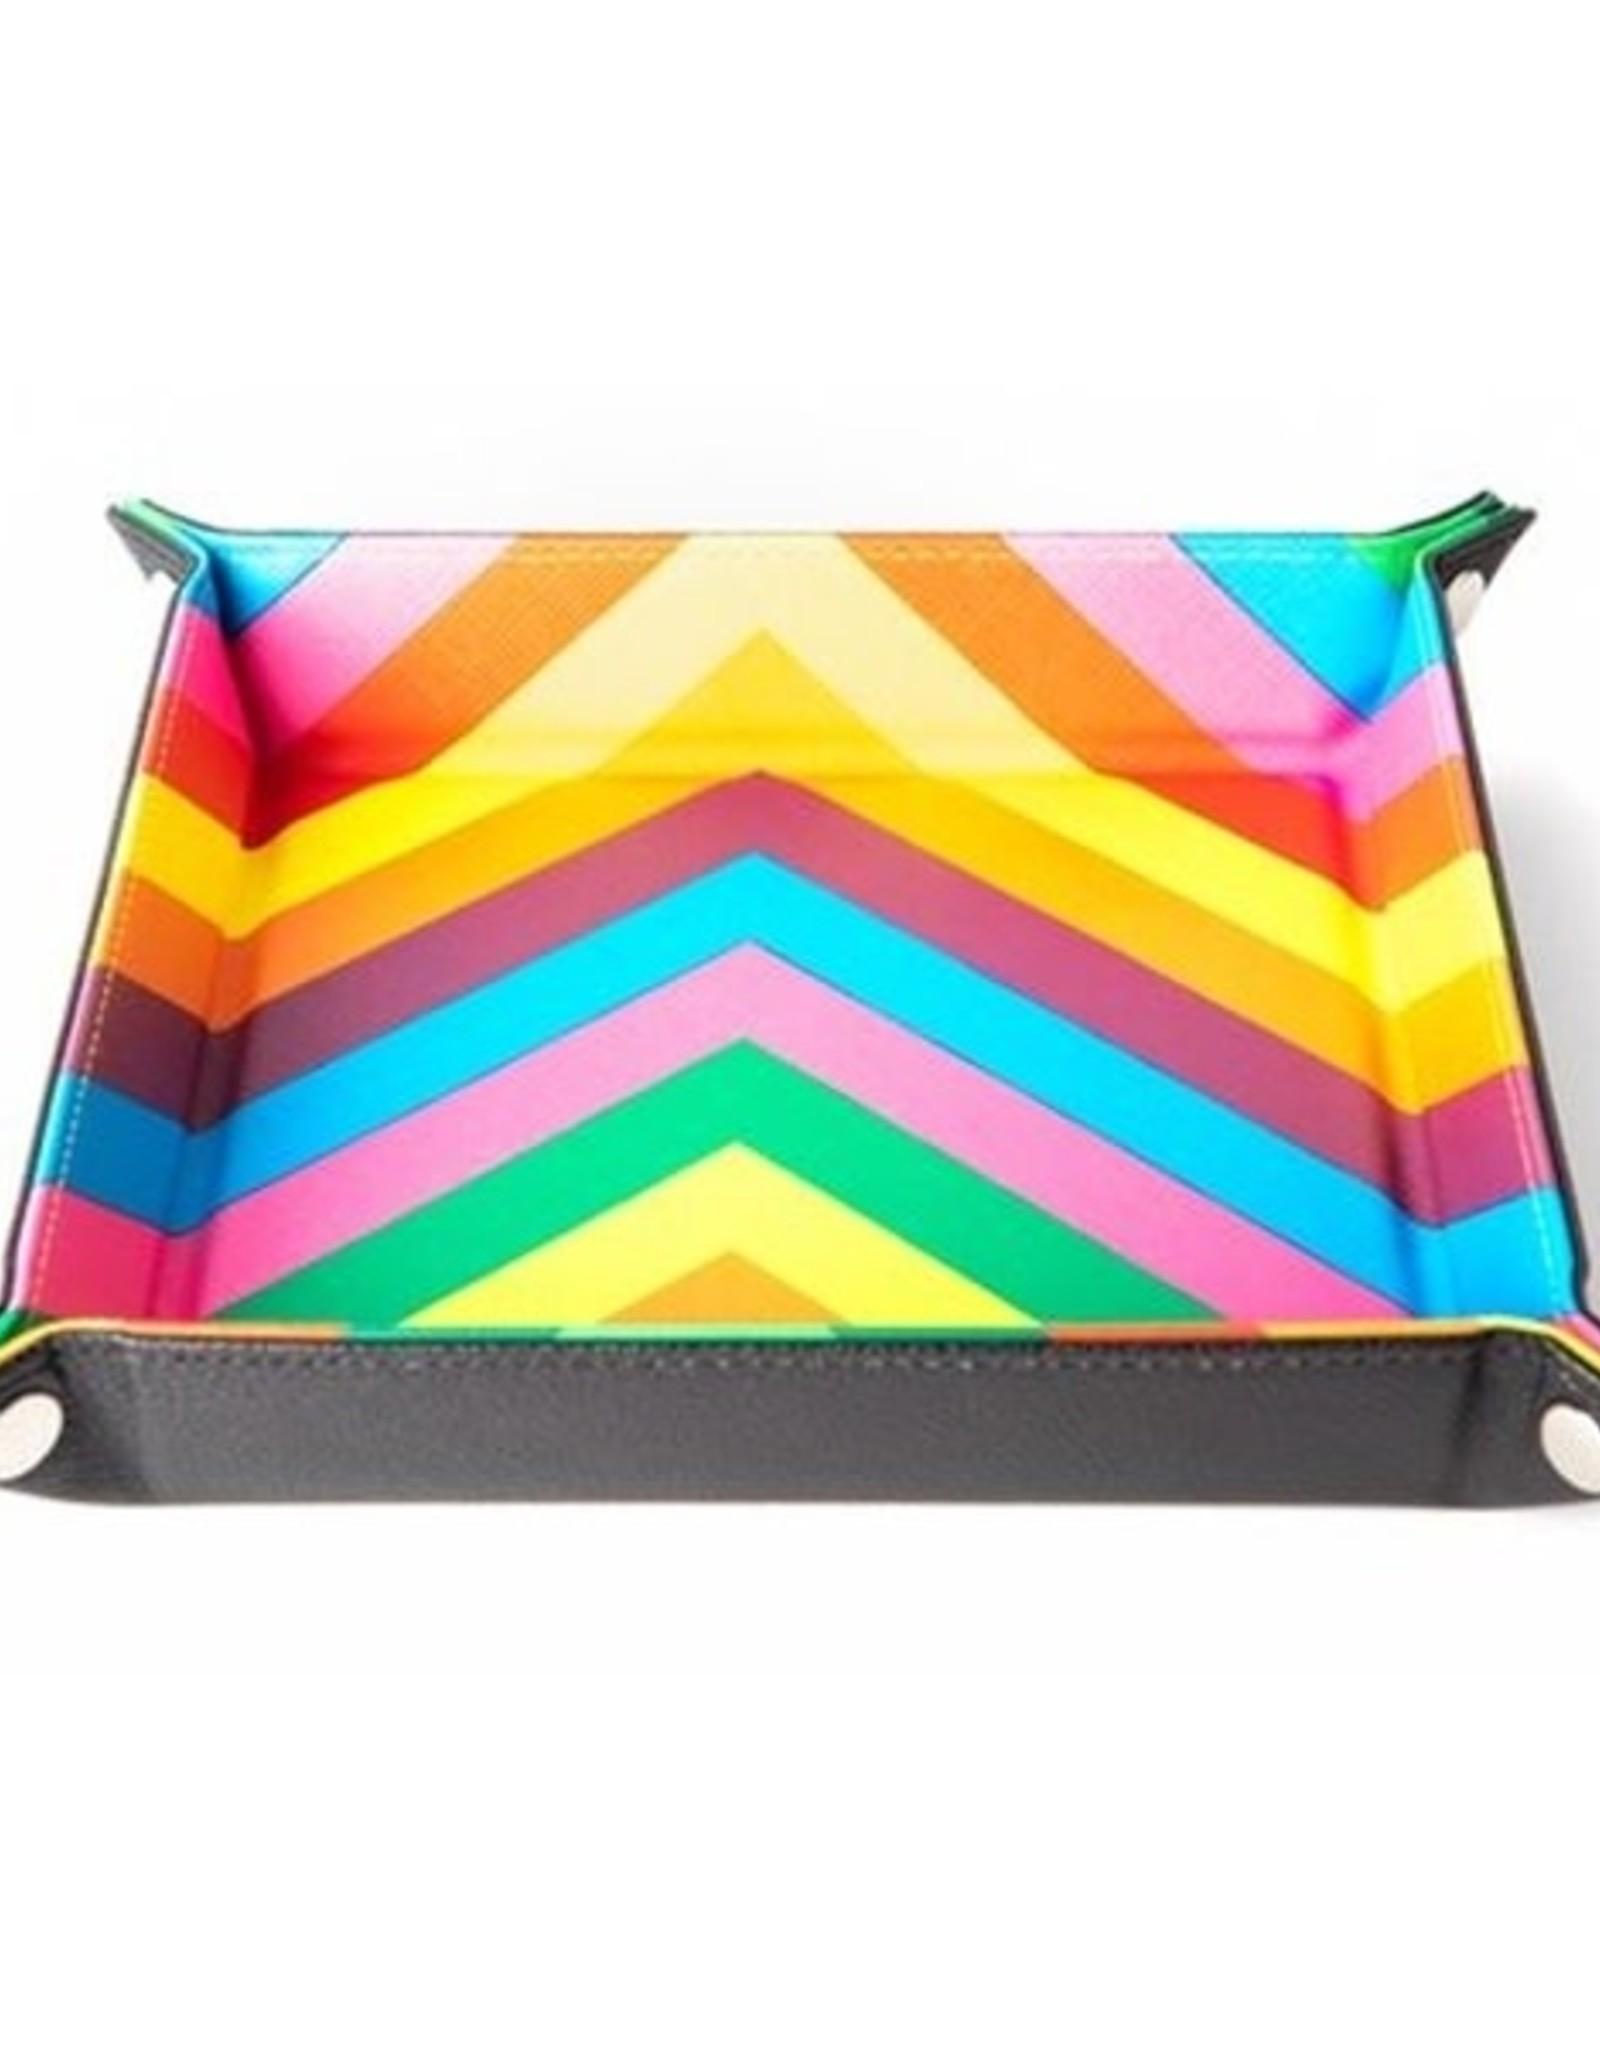 Metallic Dice Games Folding Dice Tray Rainbow Leather